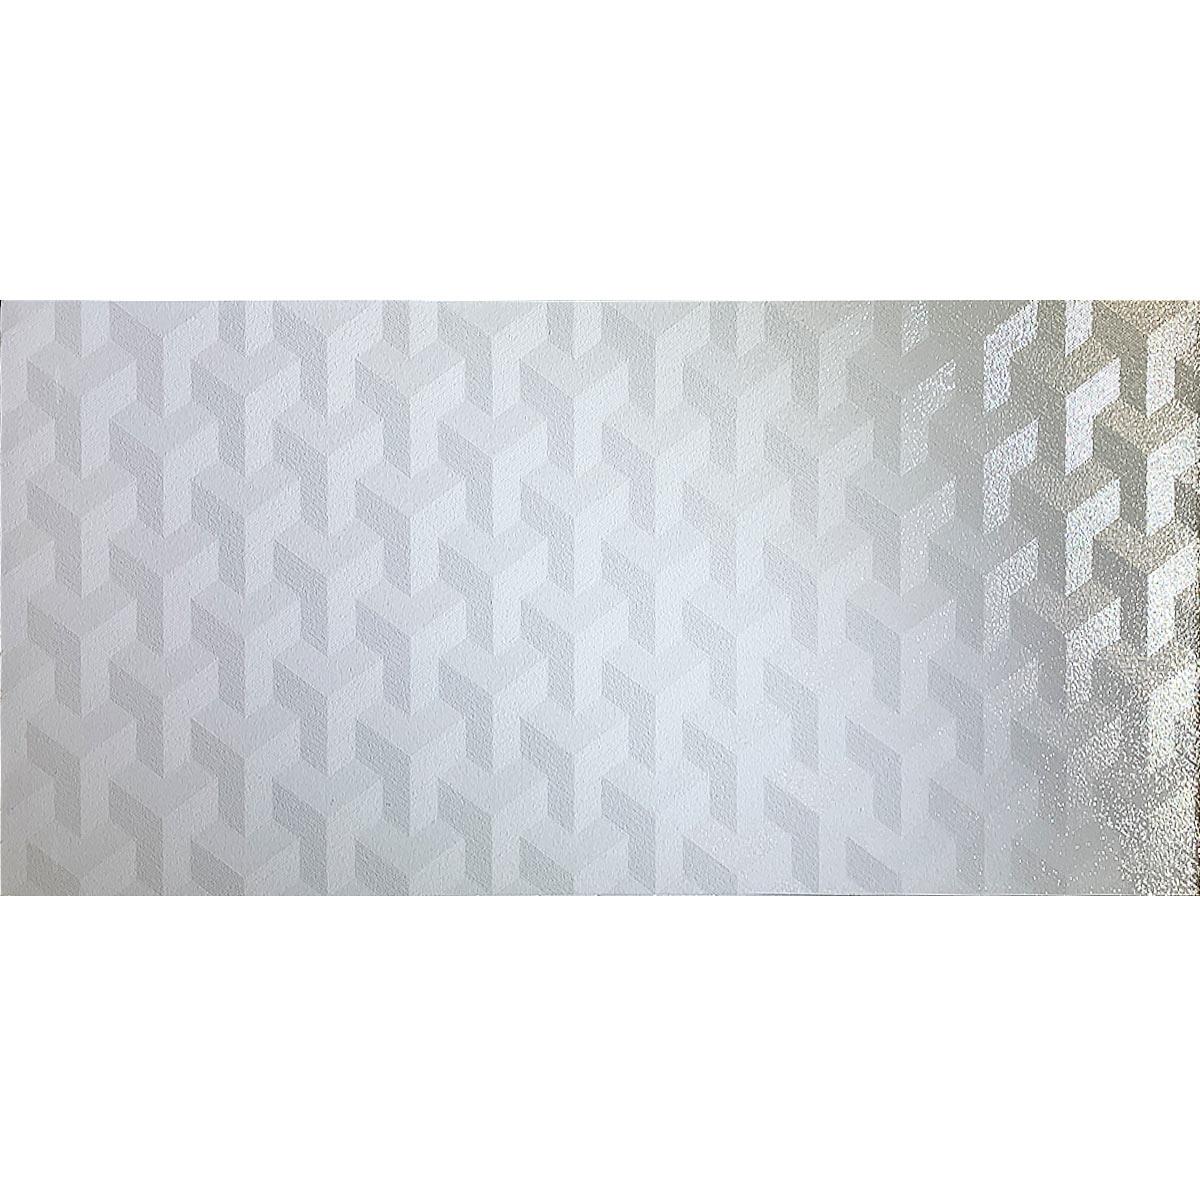 W00237 SHAPE WHITE